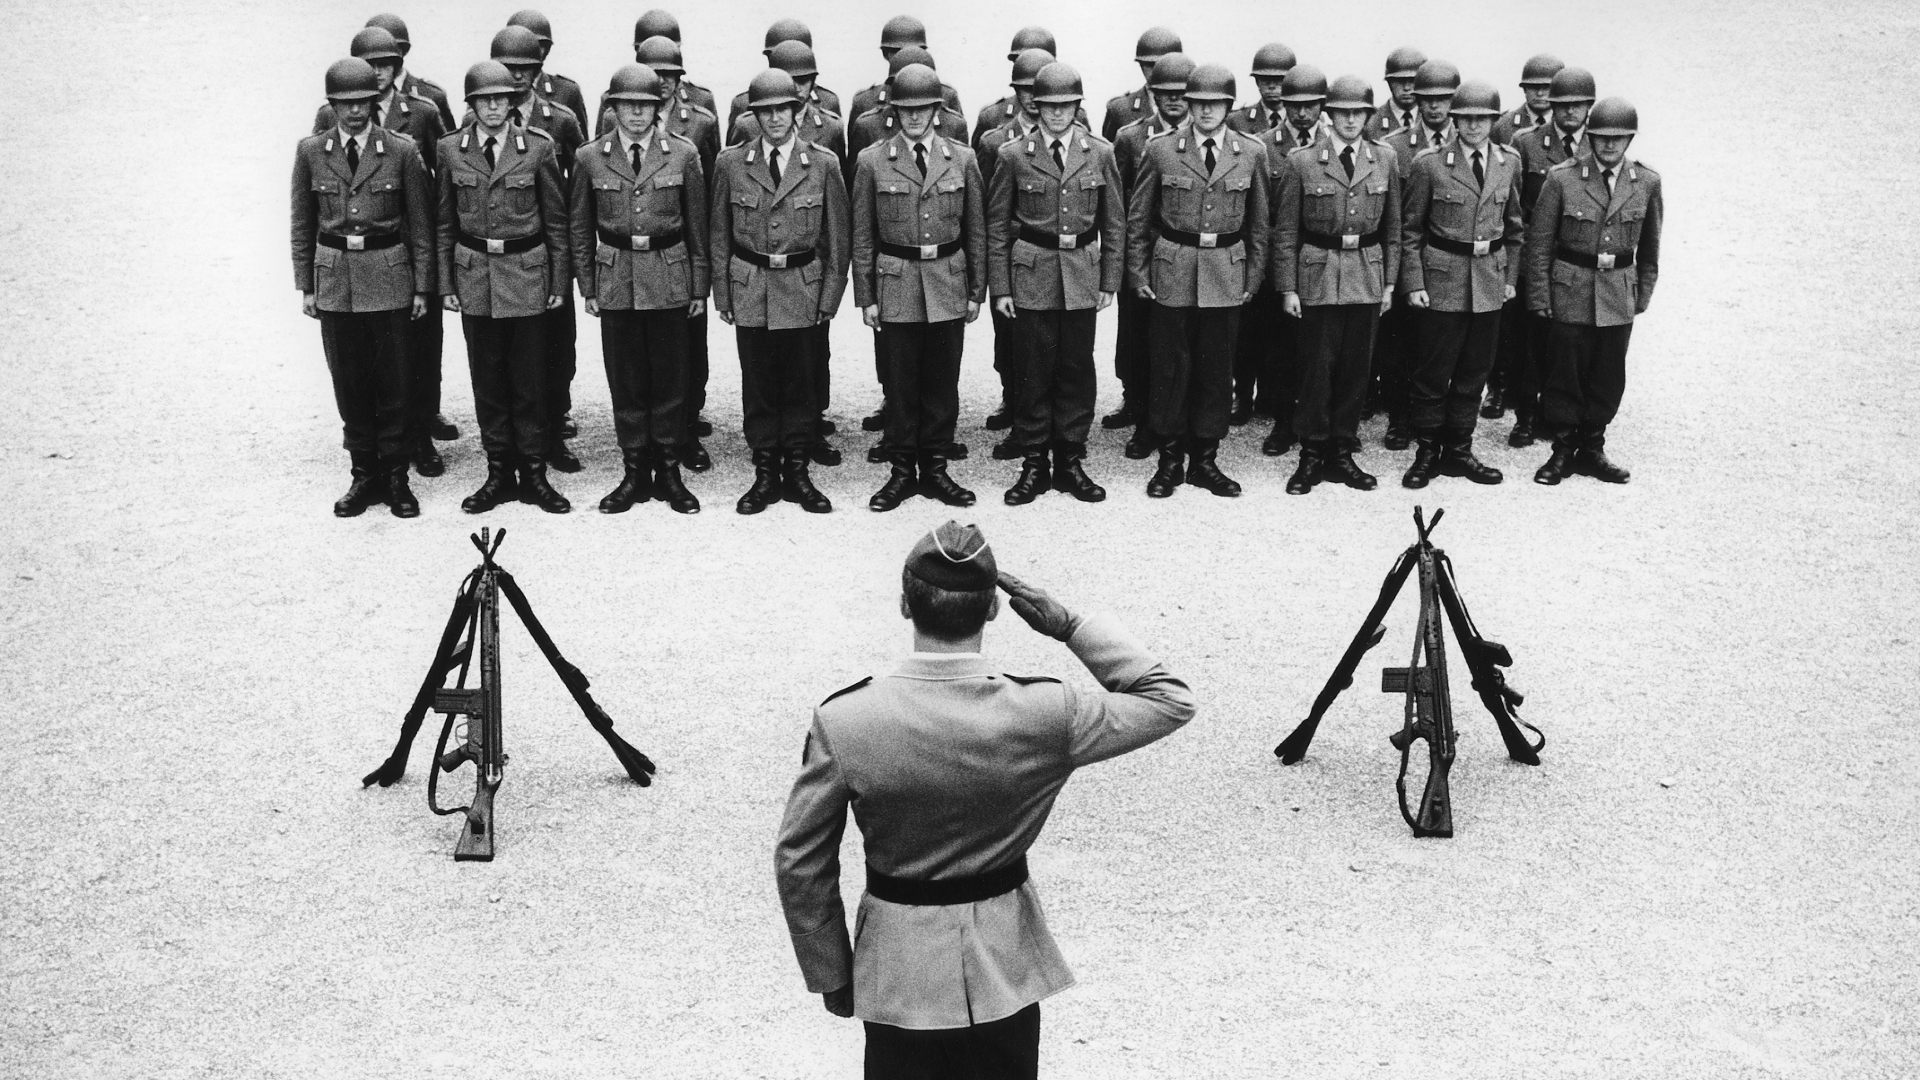 Bundeswehr soldiers assemble for roll call, 1966. (Credit: Rudolf Dietrich/ullstein bild via Getty Images)